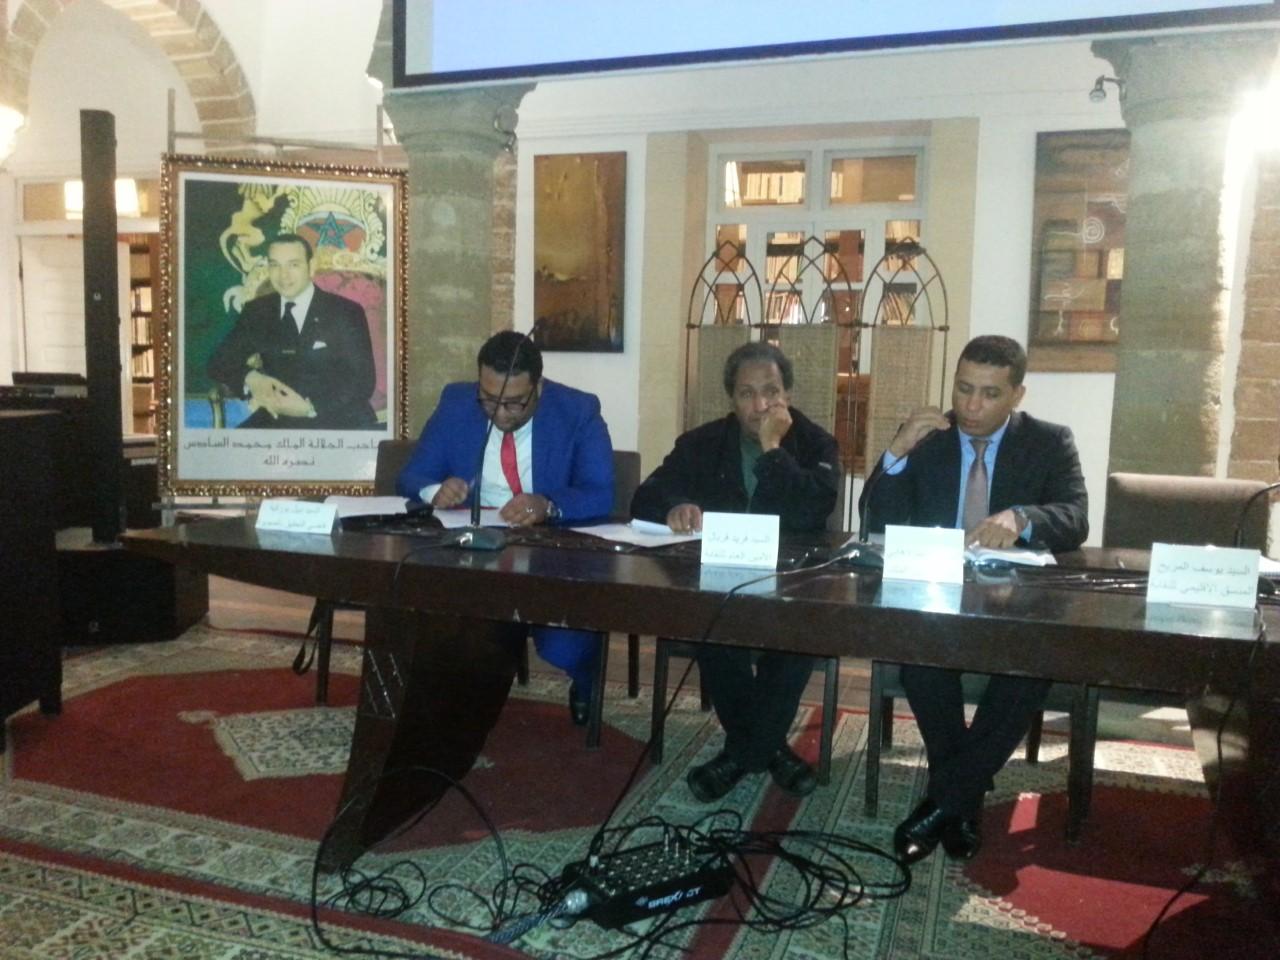 Photo of فضاء دار الصويري يحتضن يوما تكوينيا  من تنظيم النقابة المستقلة للصحافيين المغاربة